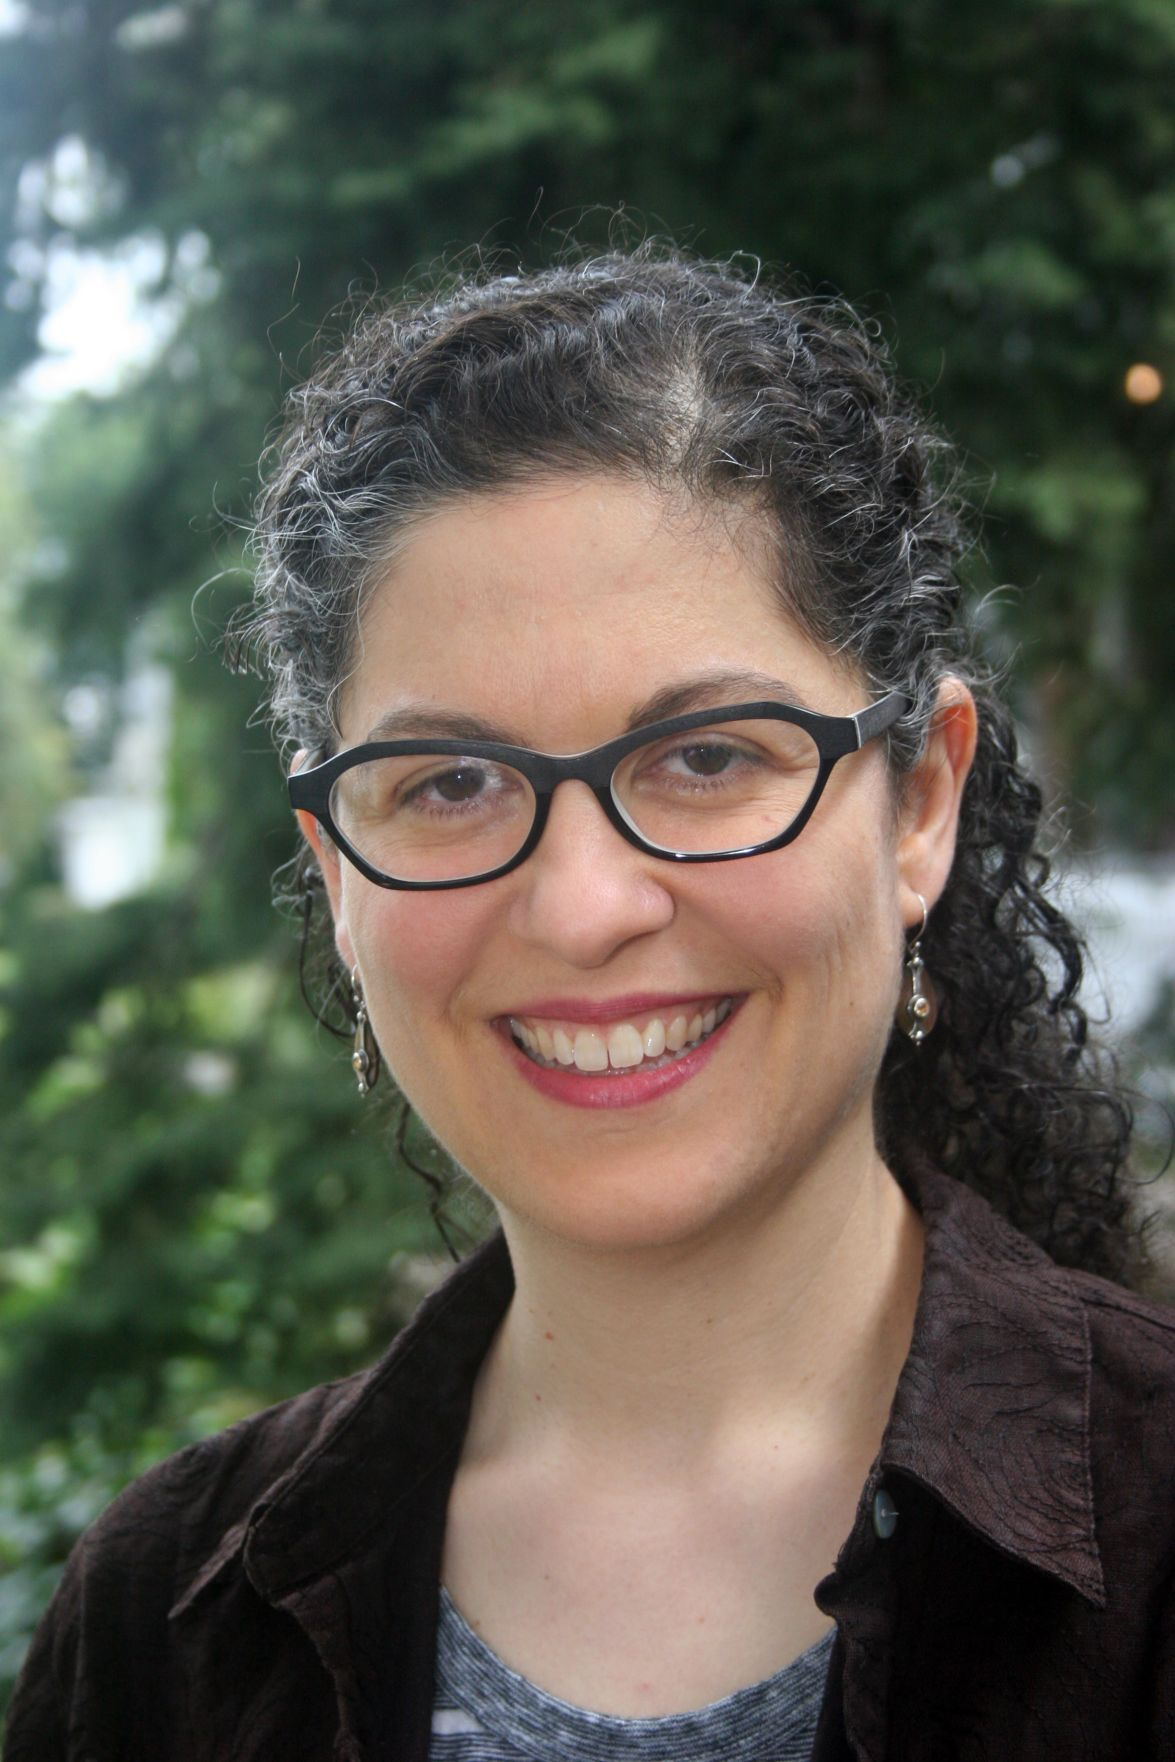 Dr. Genevieve Abravanel